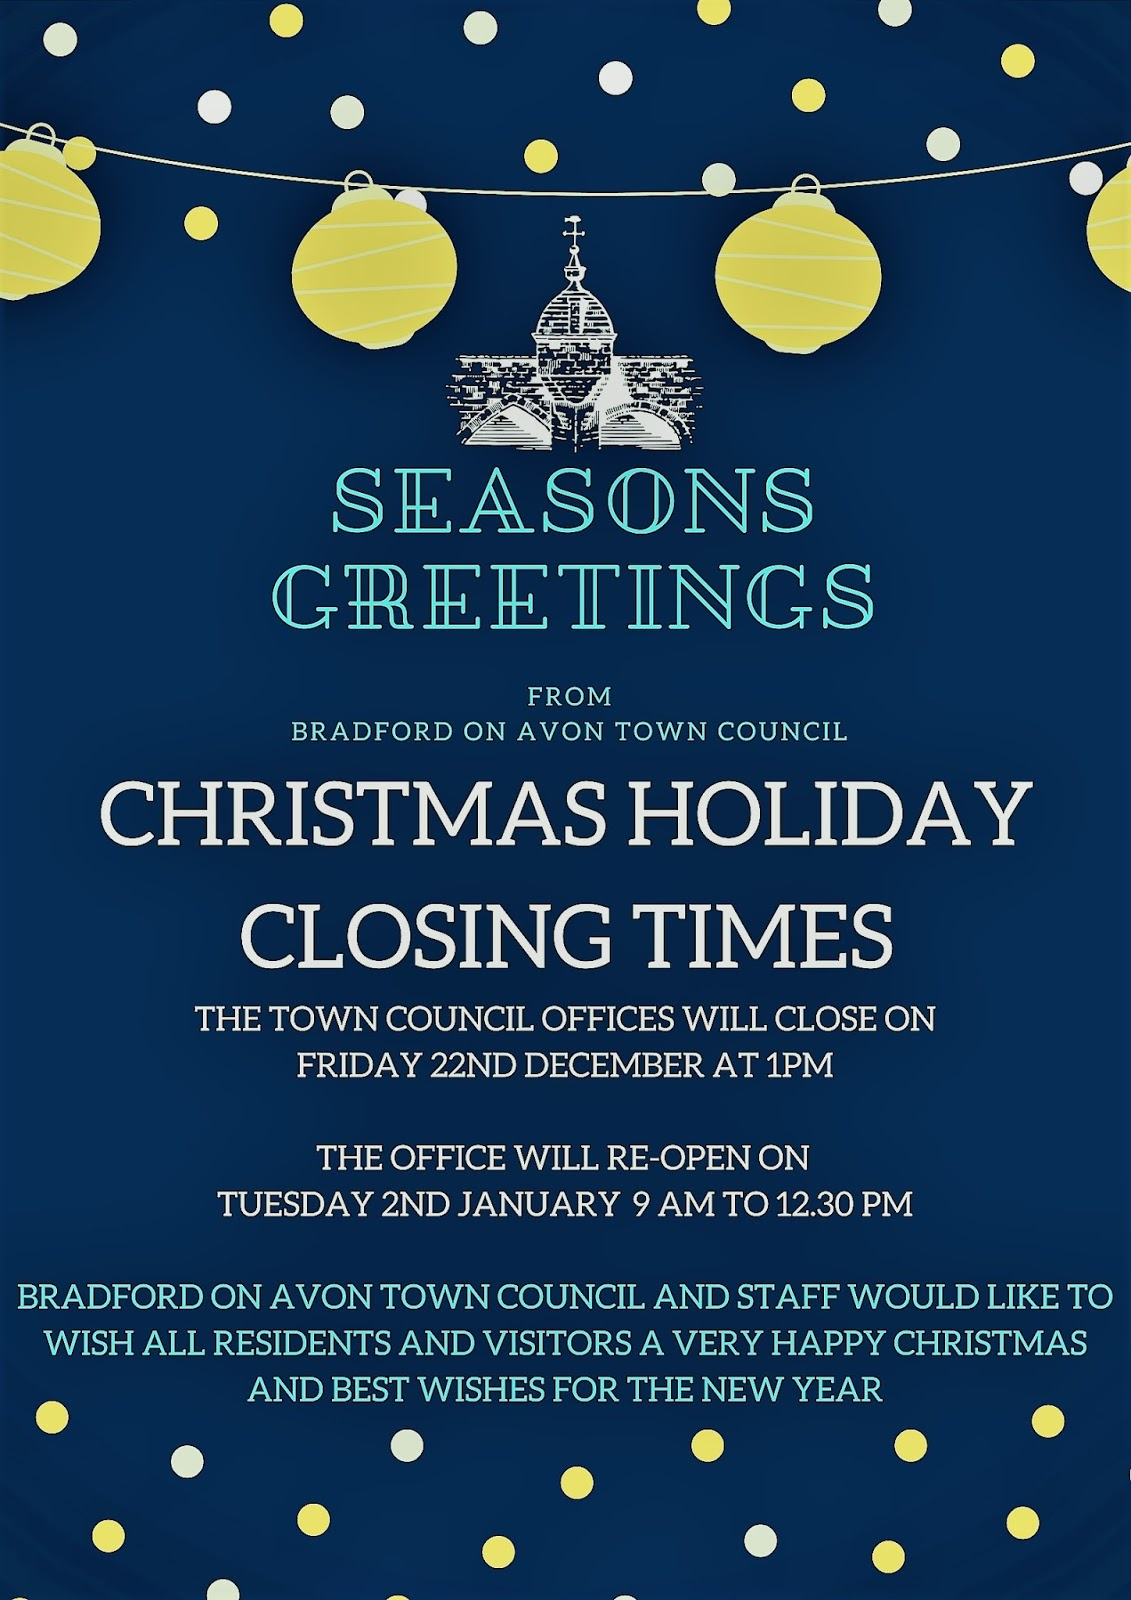 Seasons Greetings From Bradford On Avon Town Council Bradford On